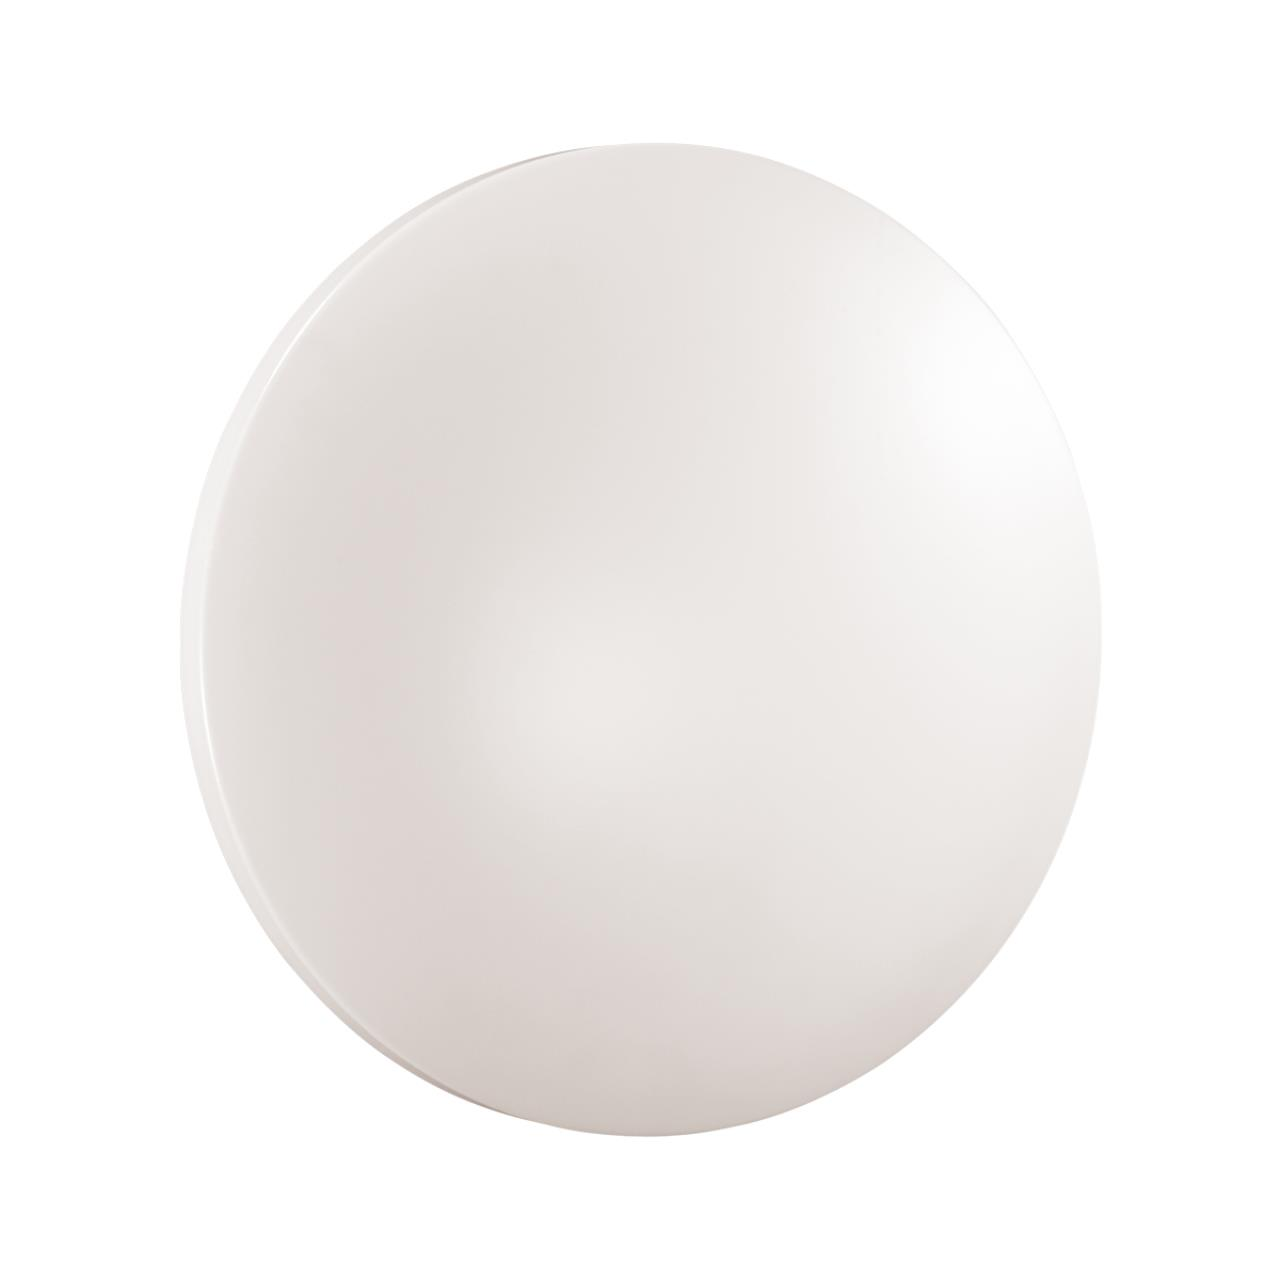 3017/EL SN 033 св-к SIMPLE пластик LED 72Вт 4000K D510 IP43